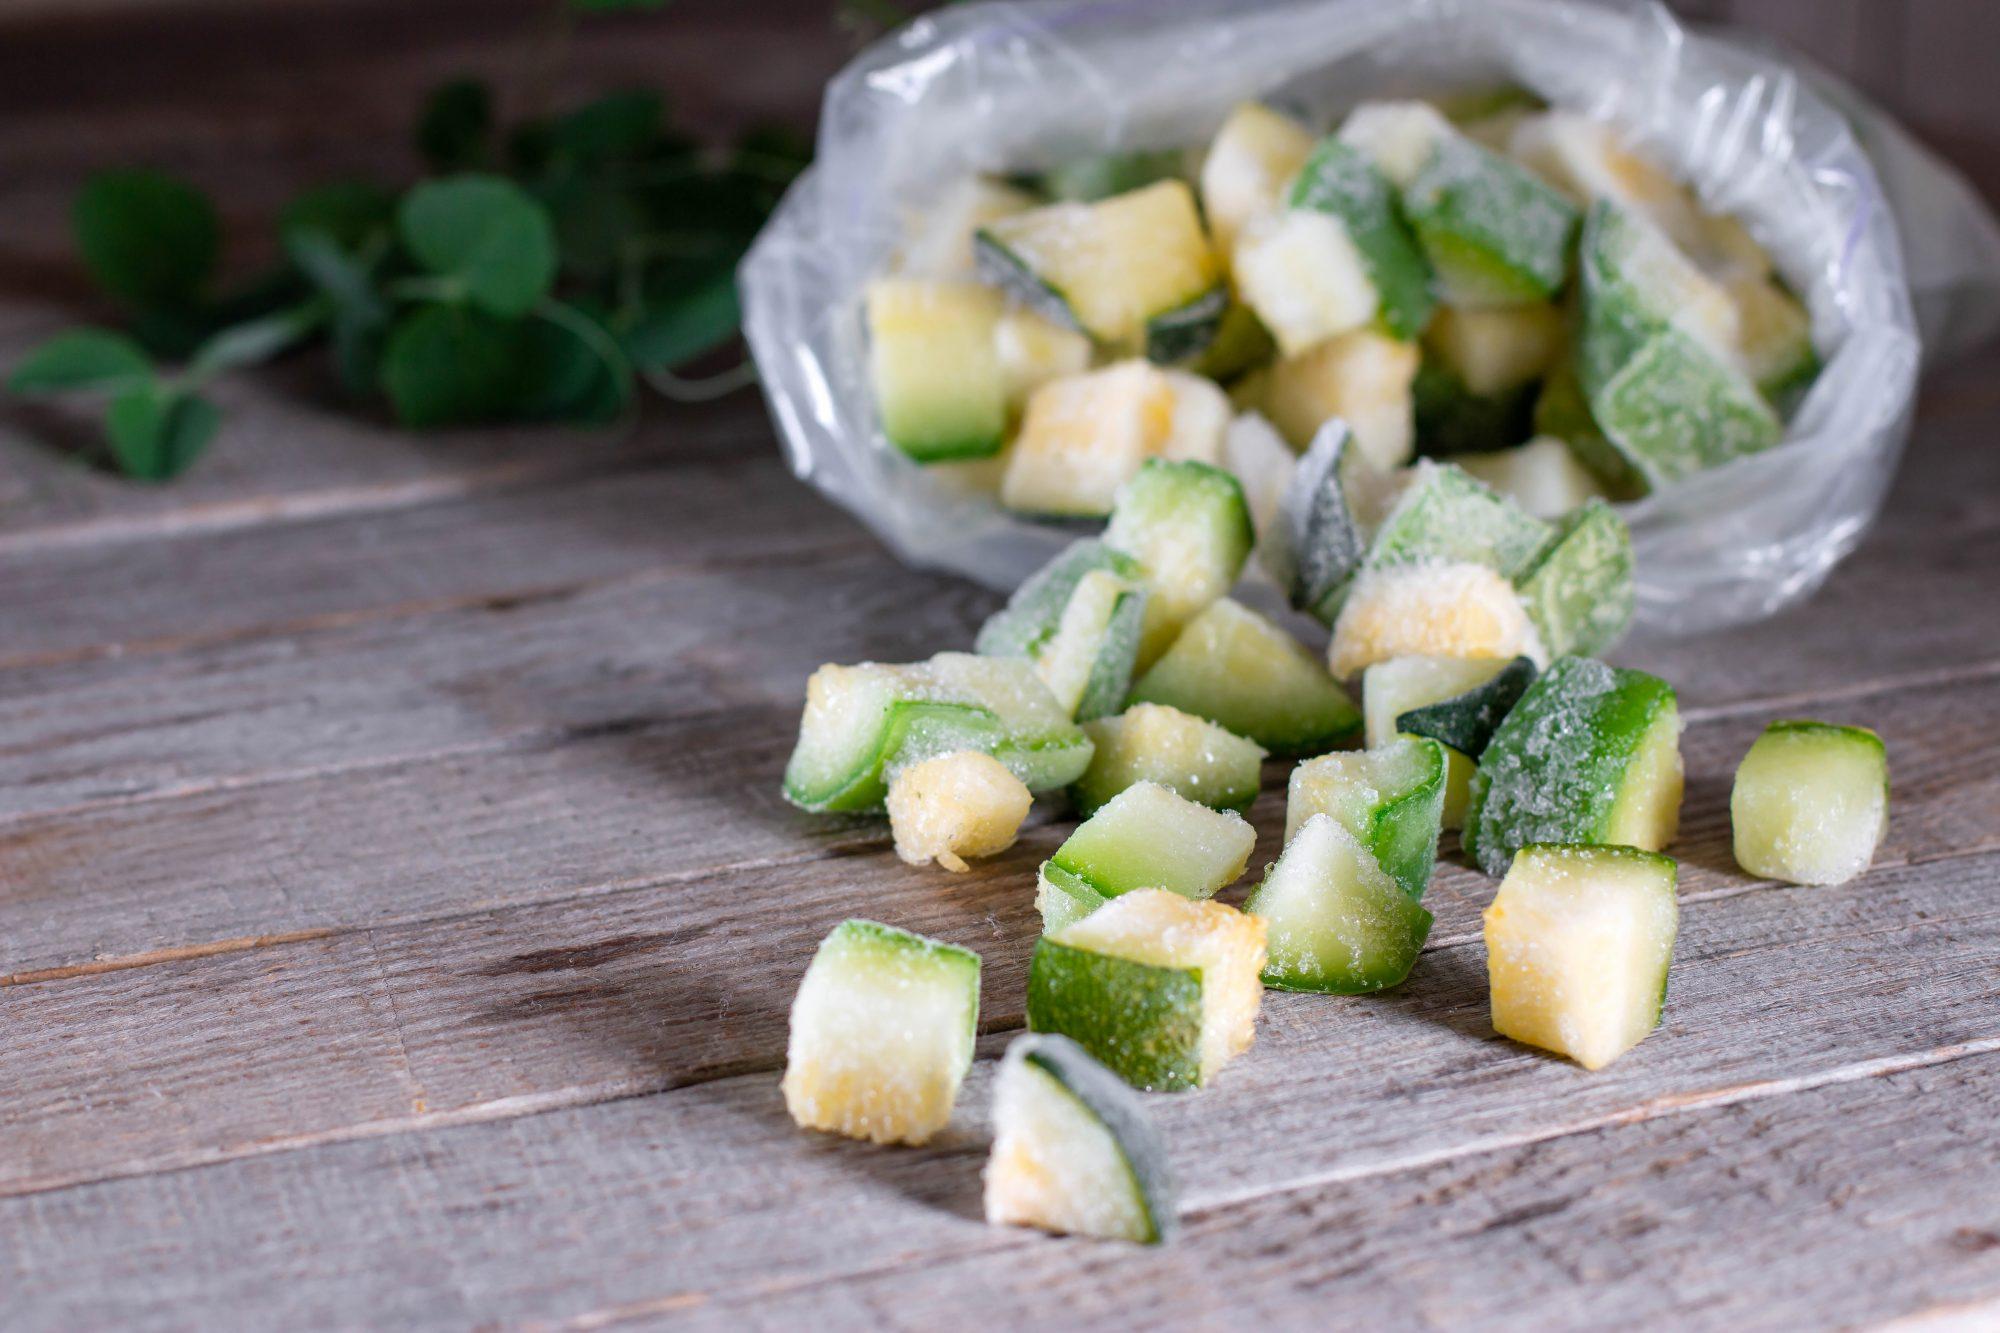 Frozen zucchini Getty 6/22/20